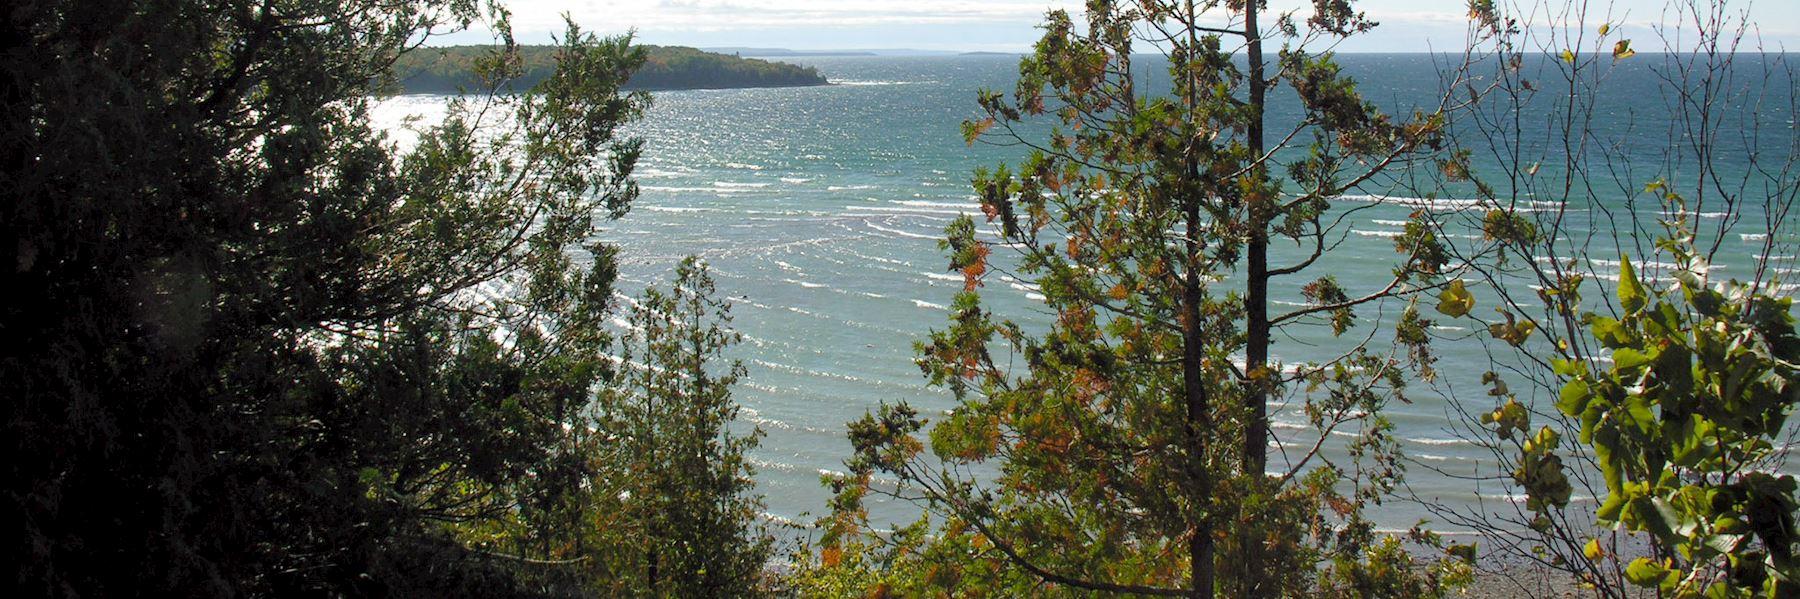 Visit Manitoulin Island, Canada